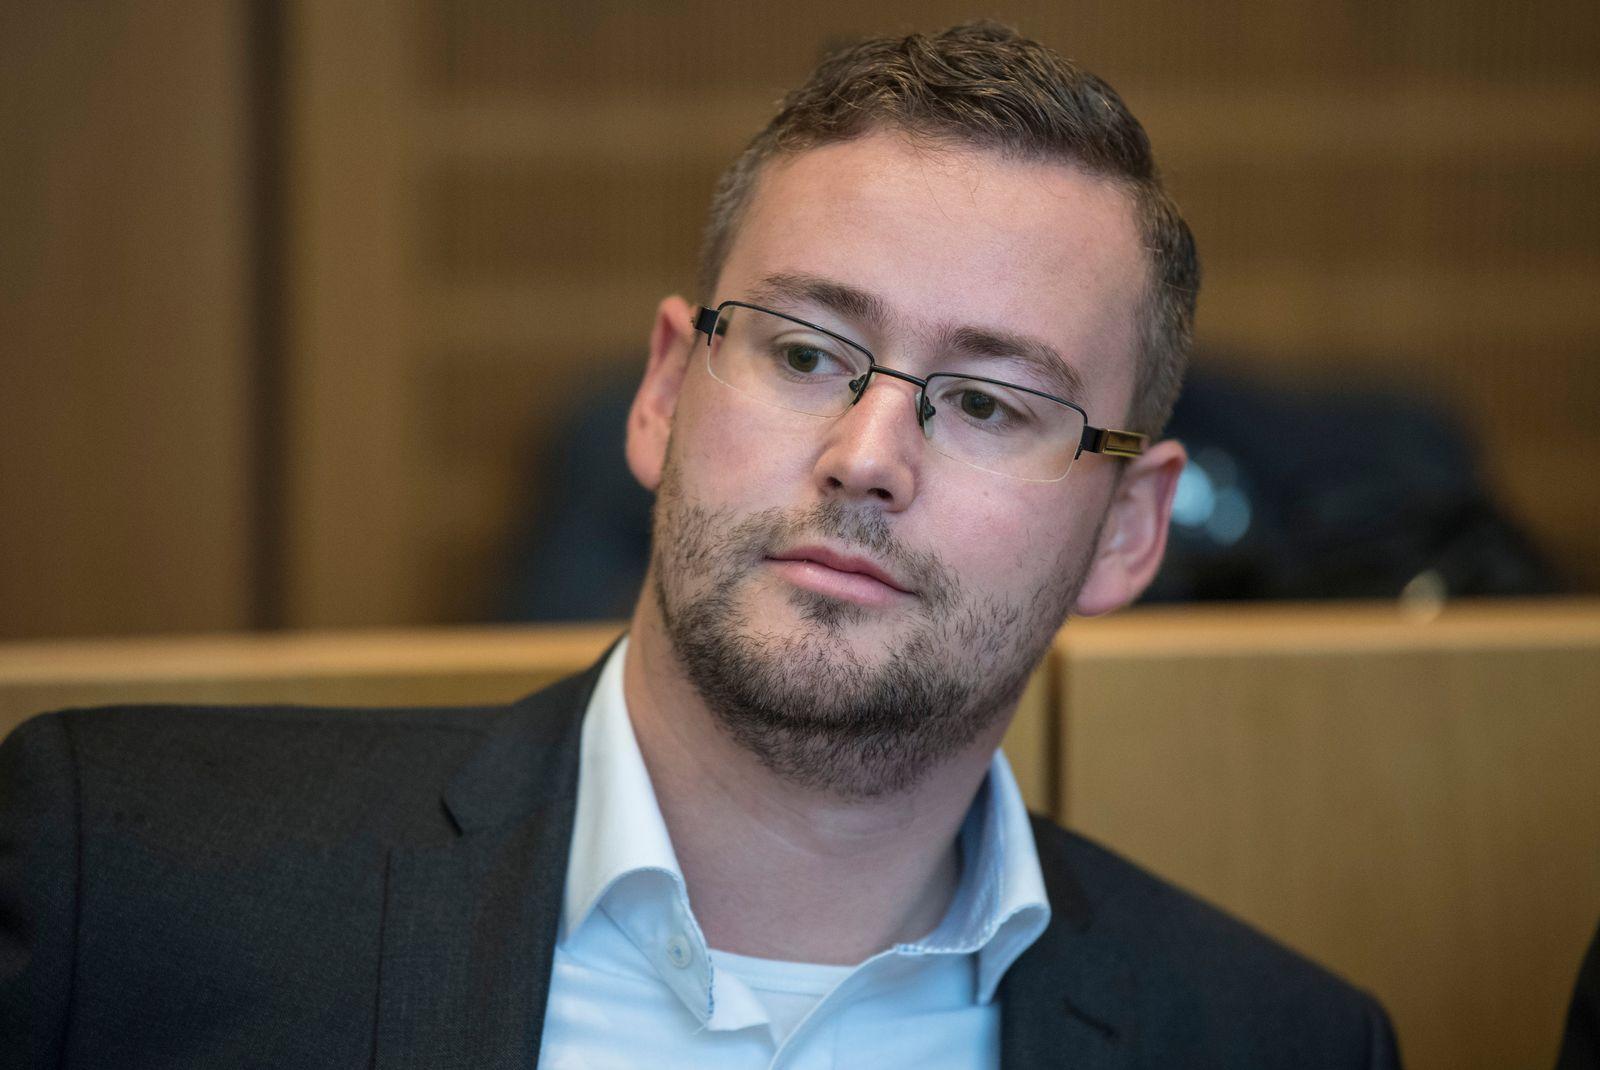 AfD-Politiker Sebastian Münzenmaier vor Gericht